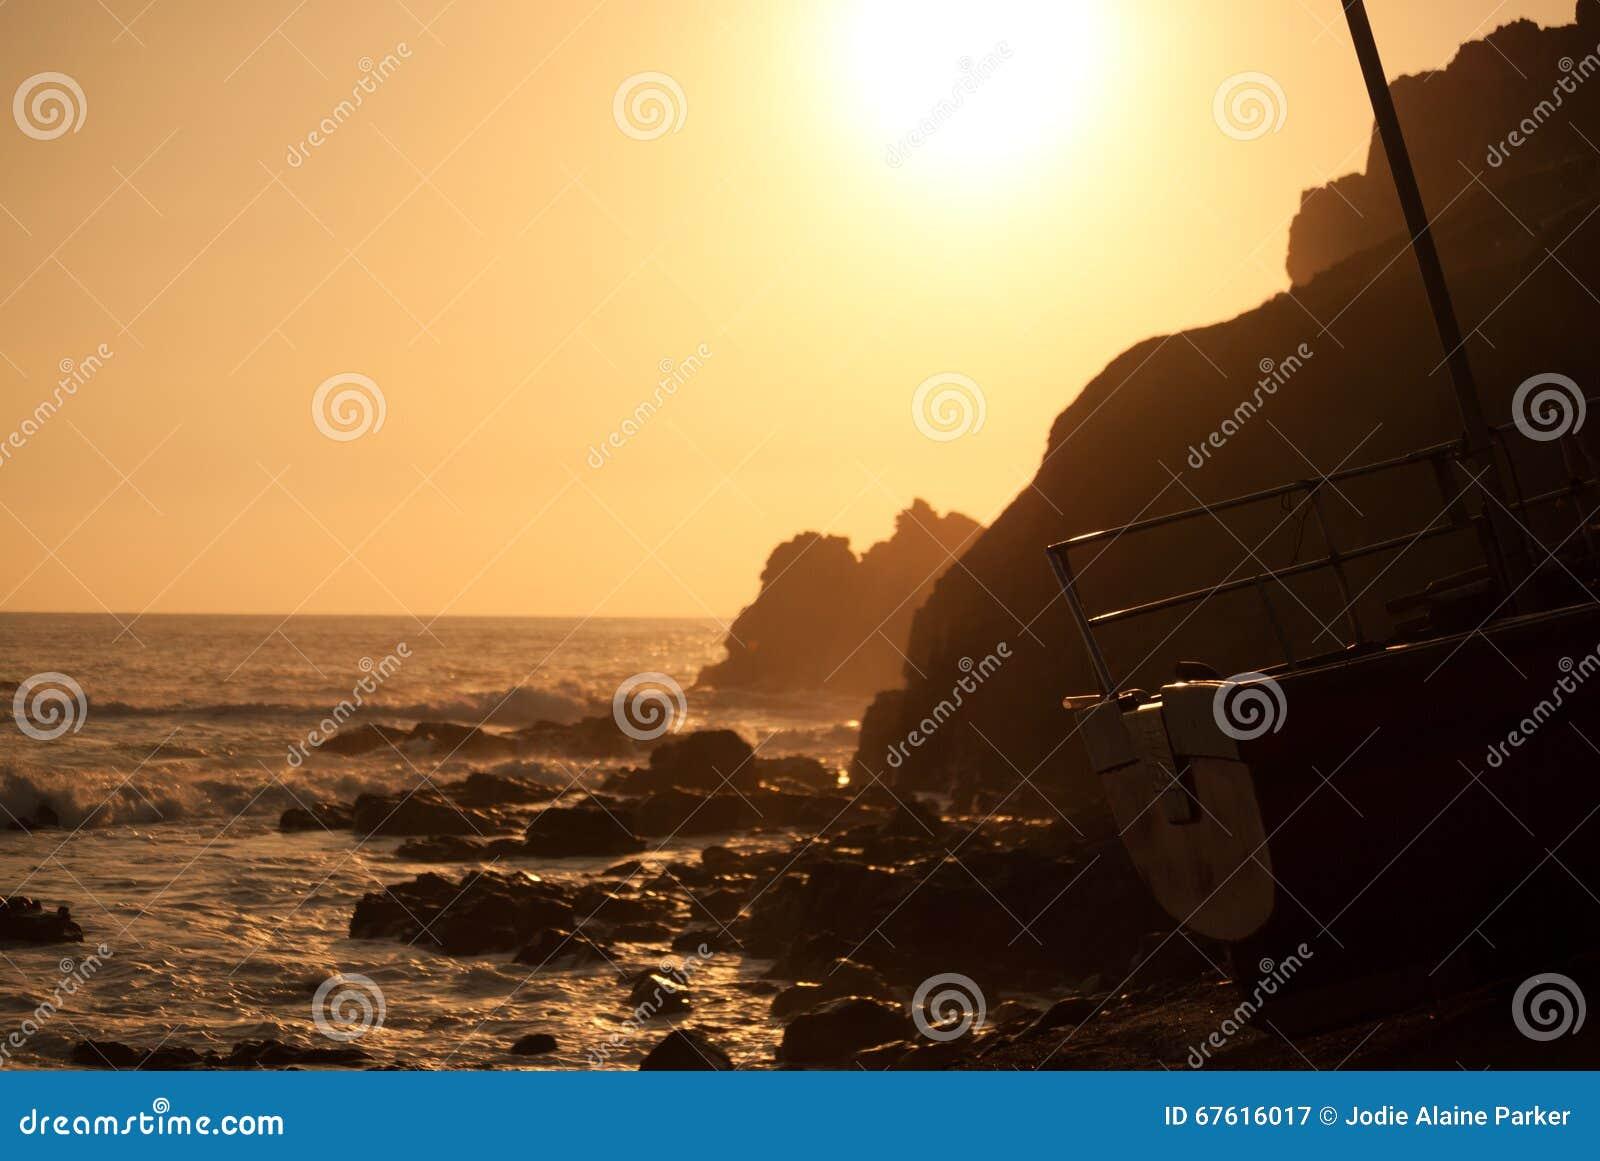 sunset sailing boats rocks - photo #17